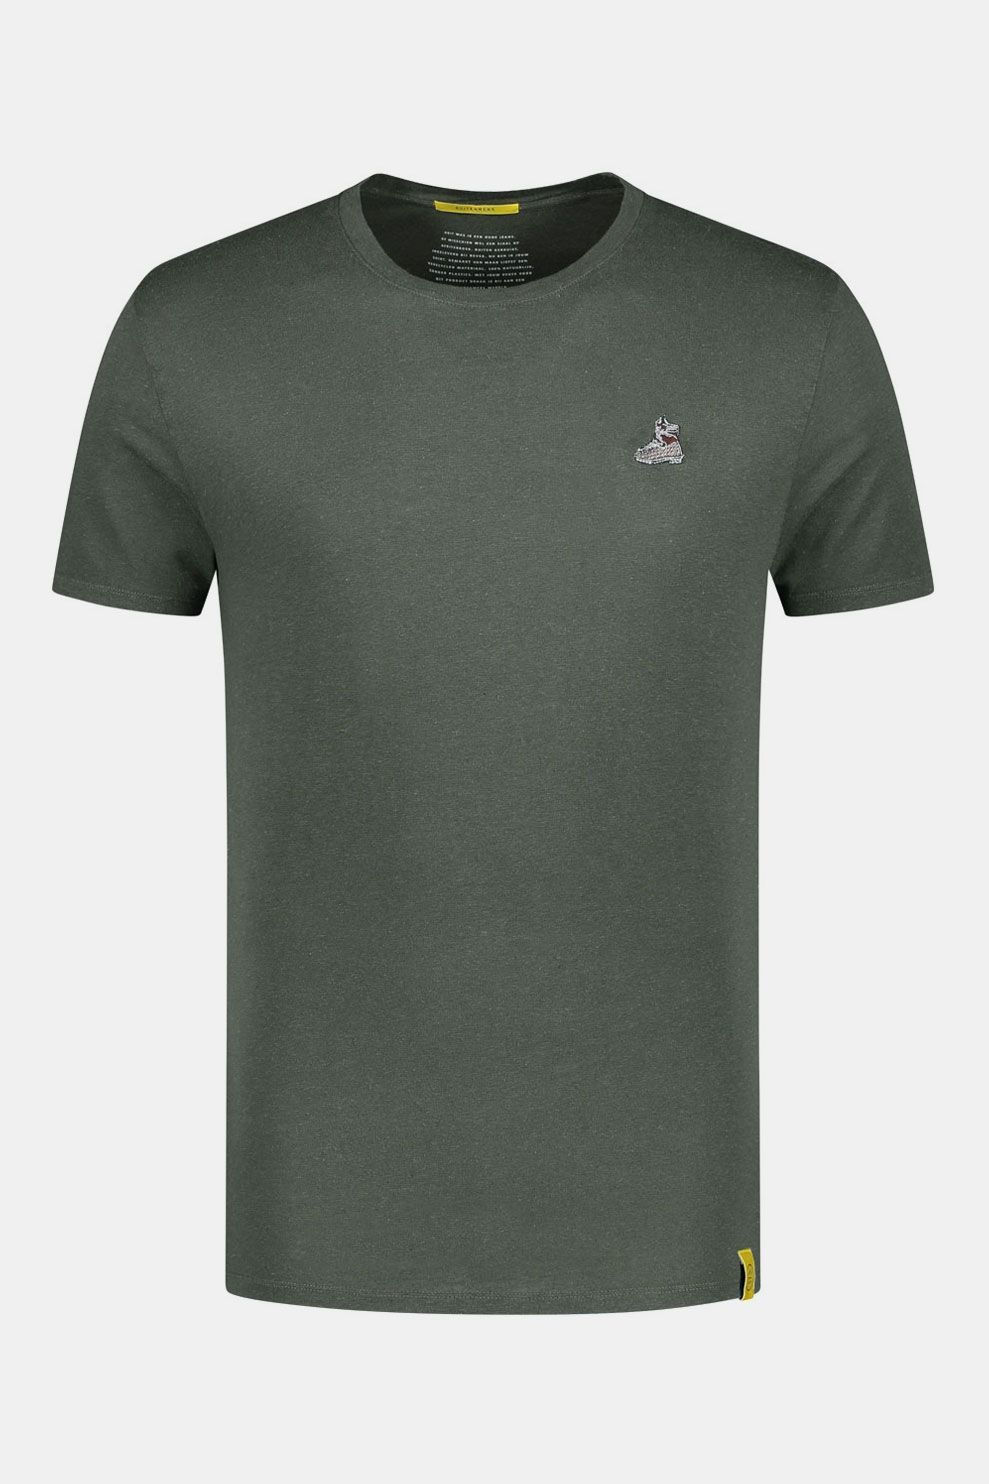 Blue Loop Originals Denimcel Buitenmens Shirt Donkergroen